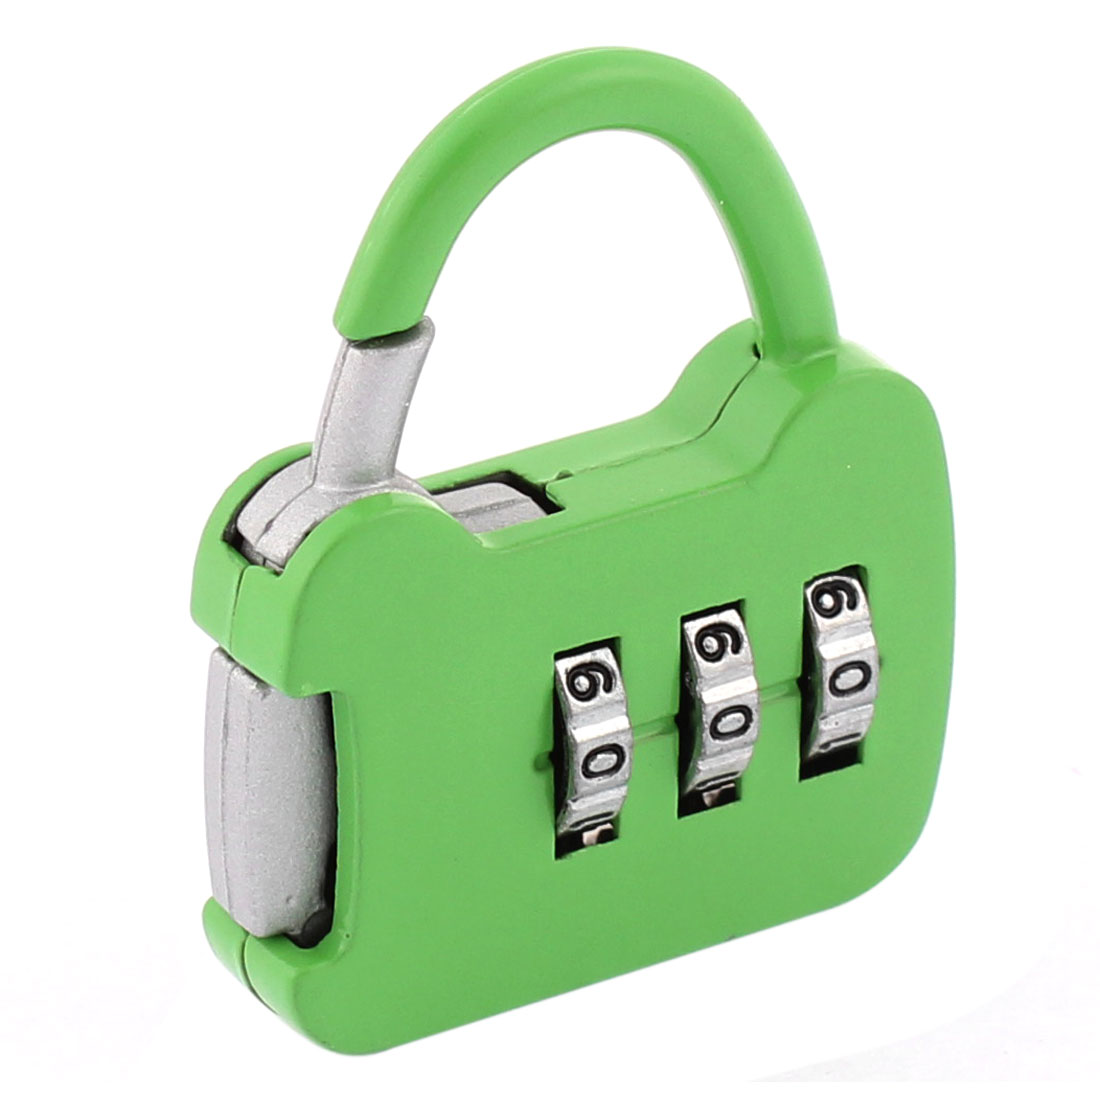 19mm x 16mm 3 Digits Metal Password Padlock Green for Tool Box Golf Case